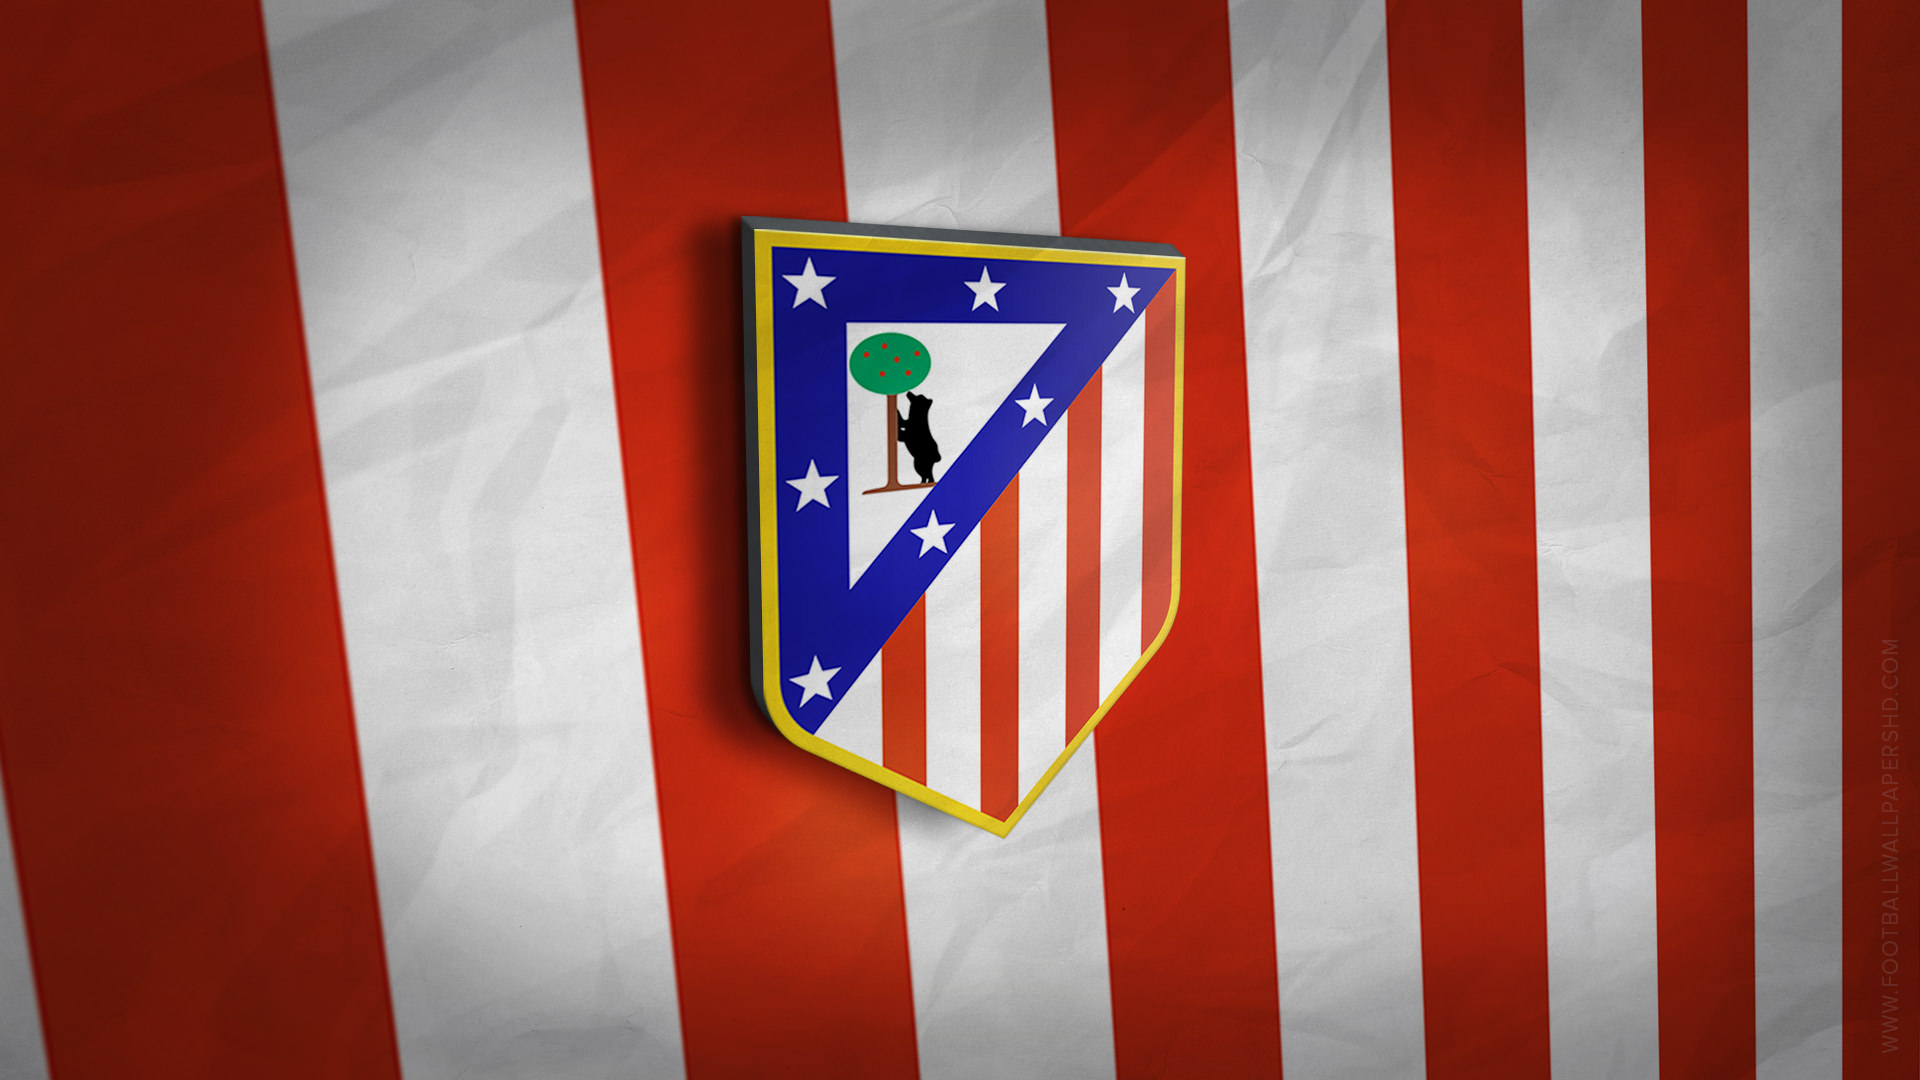 Inspirational Sports Quotes Wallpaper For Iphone Hd Atletico Madrid Logo Wallpaper Pixelstalk Net